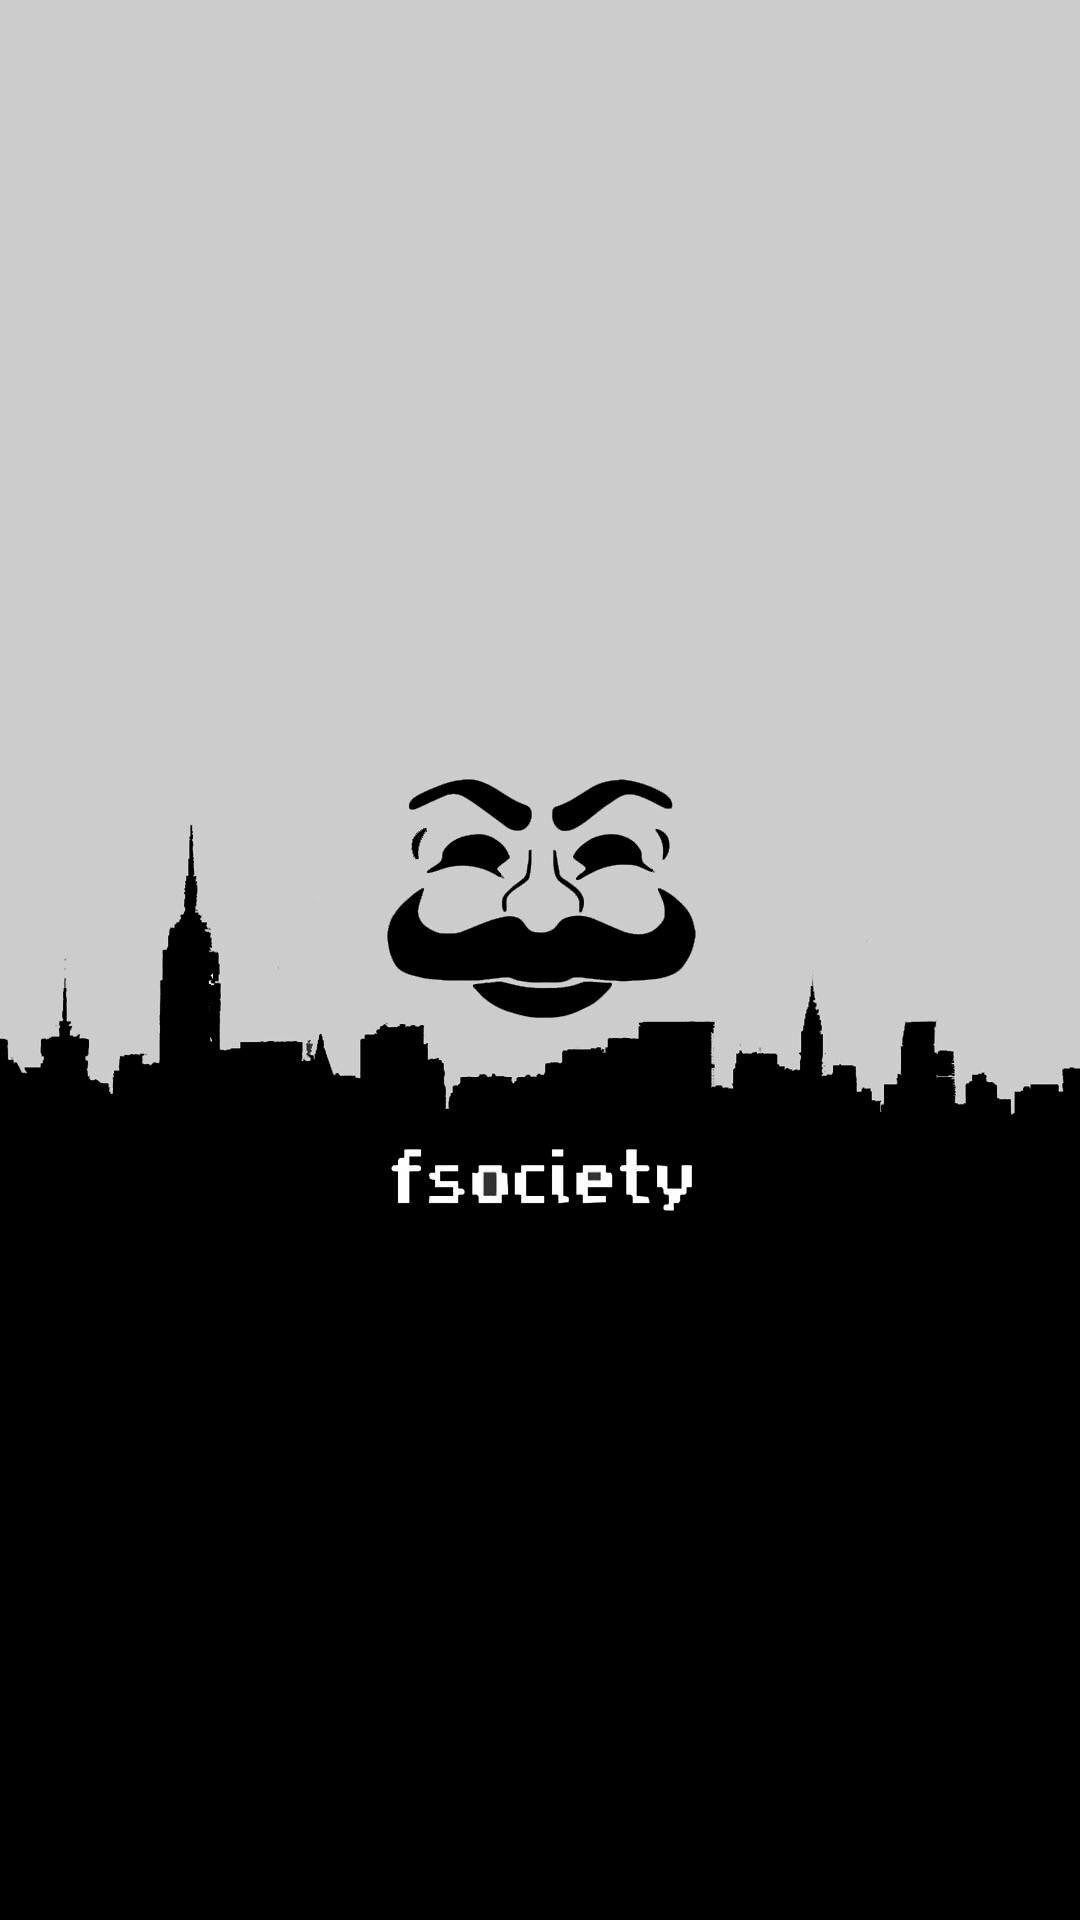 F Society Amoled Wallpaper 1080x1920 In 2019 Robot